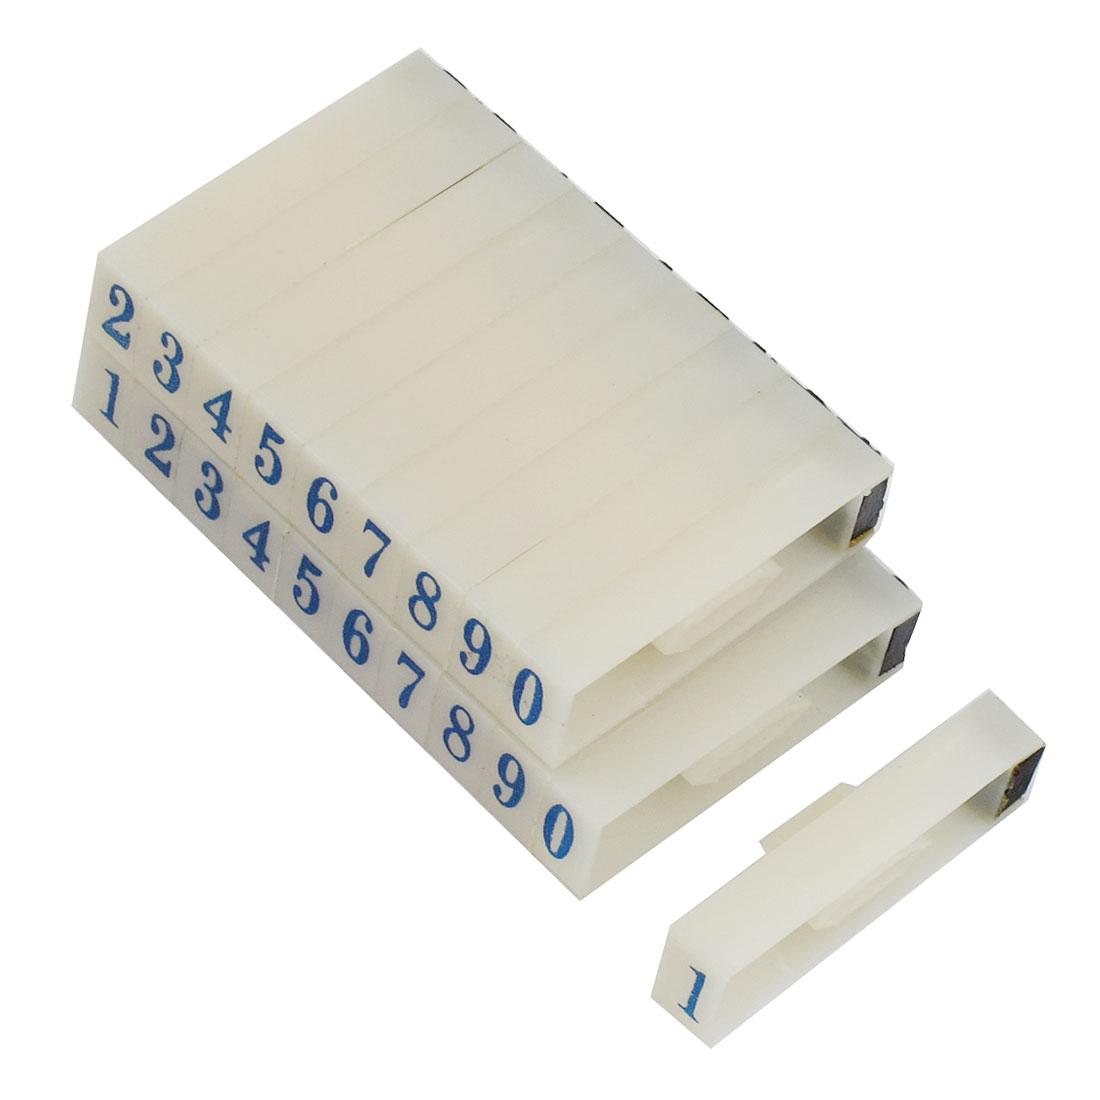 2 Pcs Plastic Blue 10 Digits Arabic Numerals Combination Stamp Block